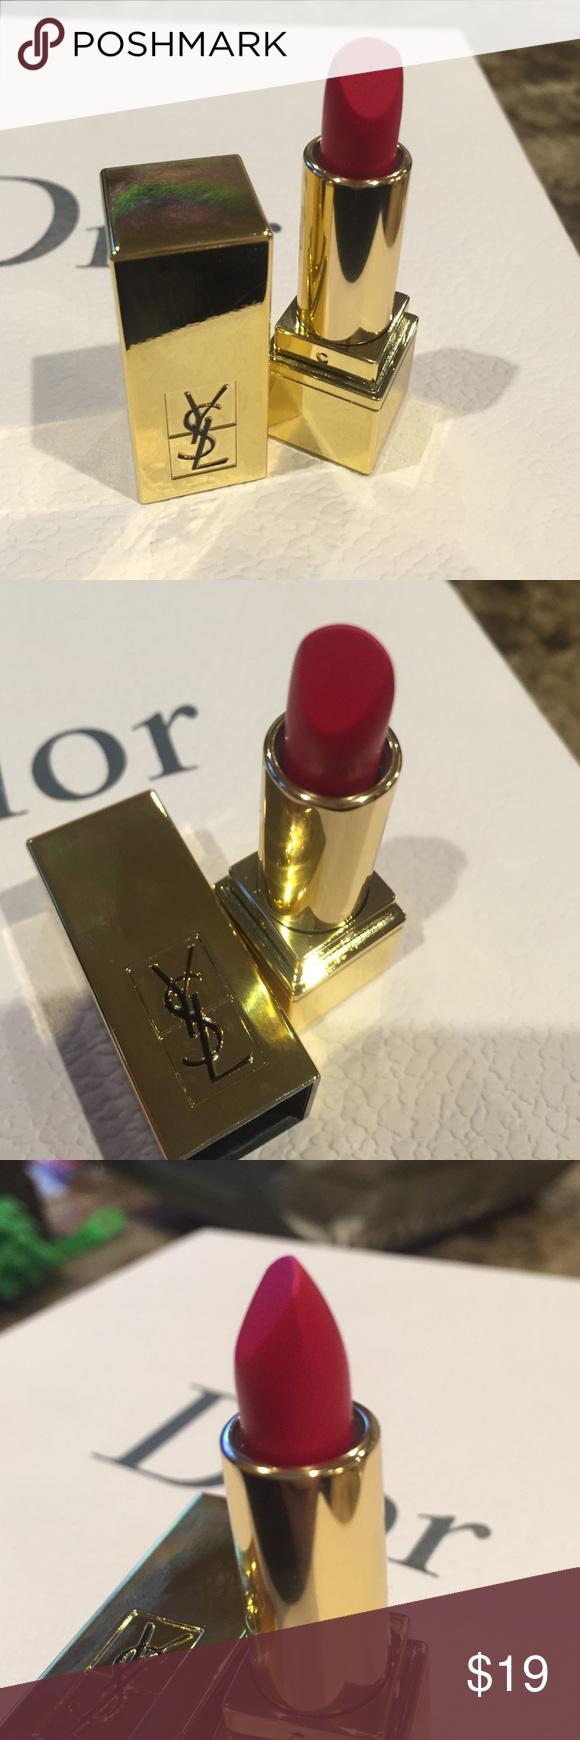 Ysl Matte Res Lipstick brand New Ysl matte red lipstick brand-new never used By Yves Saint Laurent; made in France   × no trades ✓ offers  welcome  bundle & save   ᴀʟʟ ɪᴛᴇᴍs sʜɪᴘ ᴏᴜᴛ ɴᴇxᴛ ʙᴜsɪɴᴇss ᴅᴀʏ Sephora Makeup Lipstick